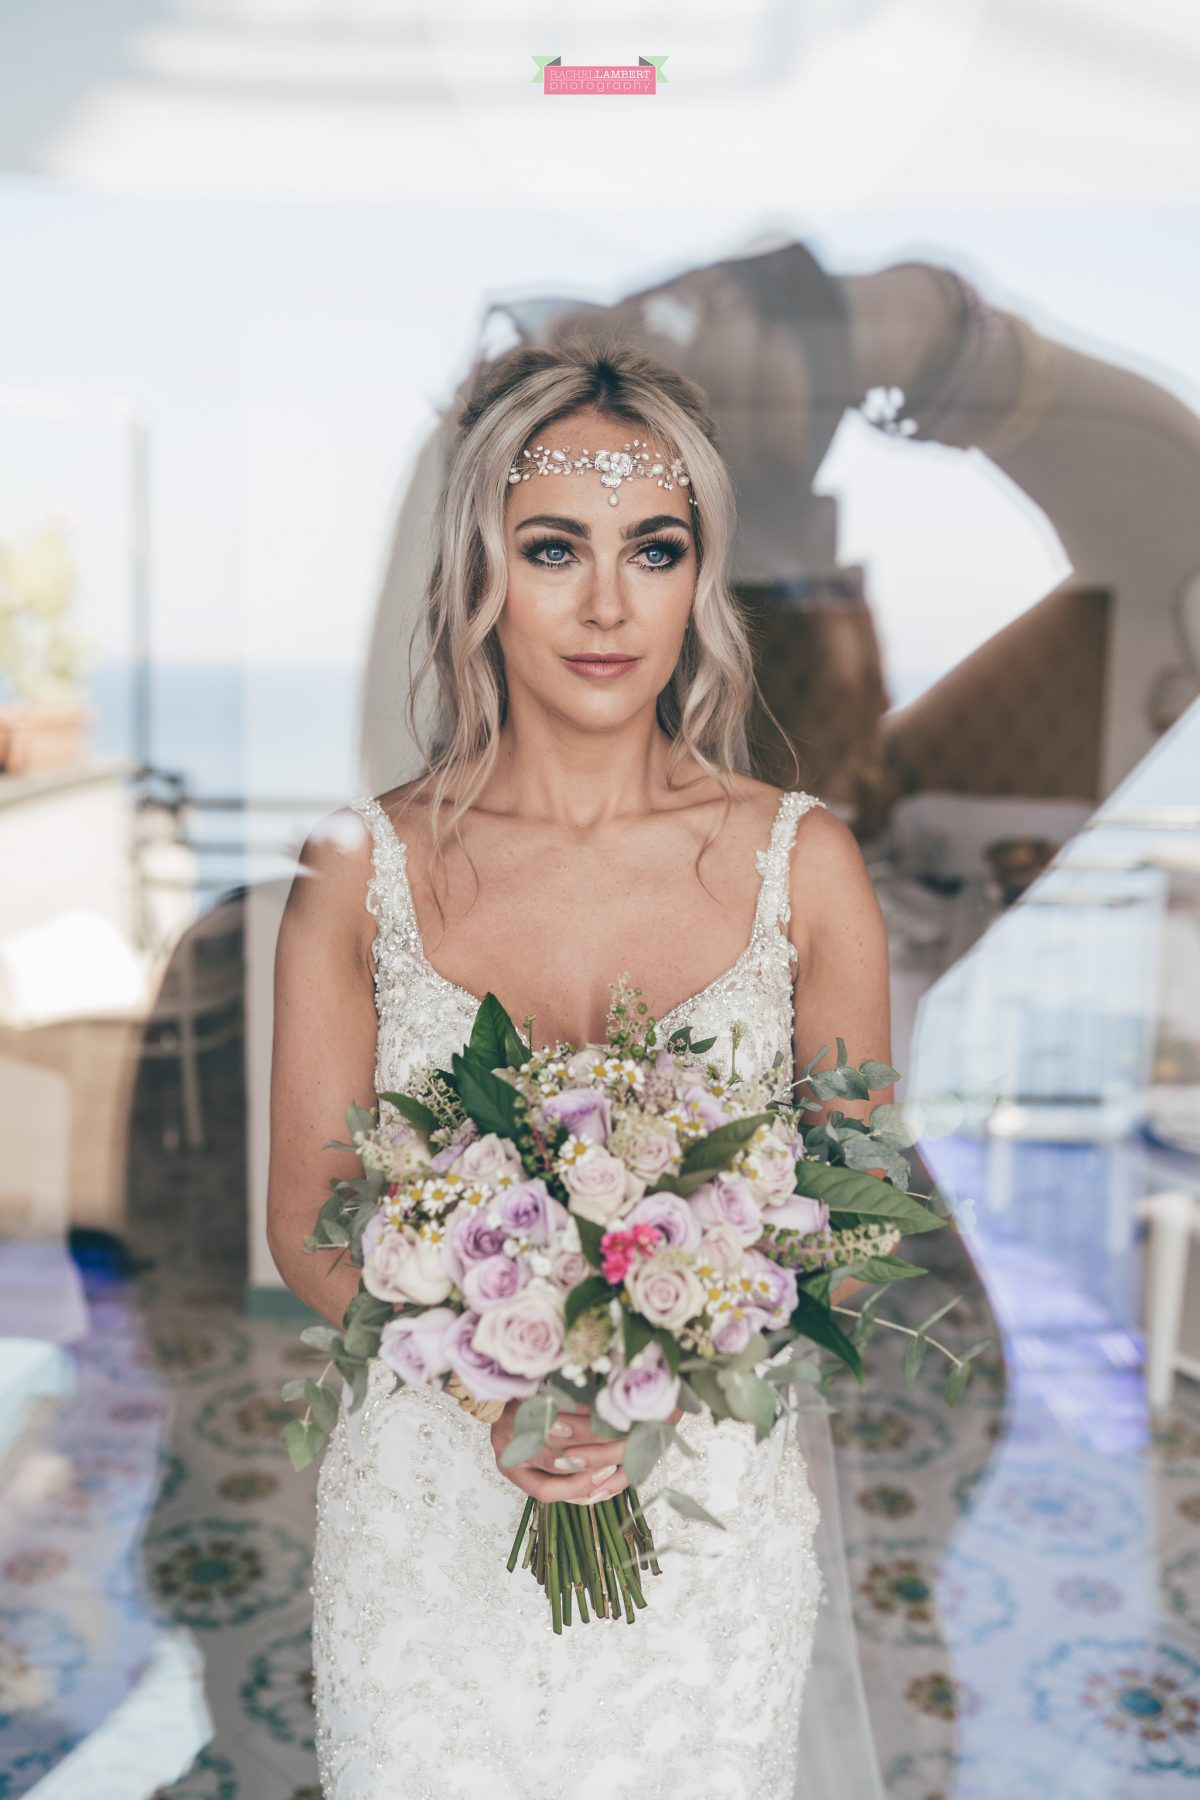 wedding photographer sorrento italy bride and groom chiostro di san francesco laura may bridal prep at the bristol hotel